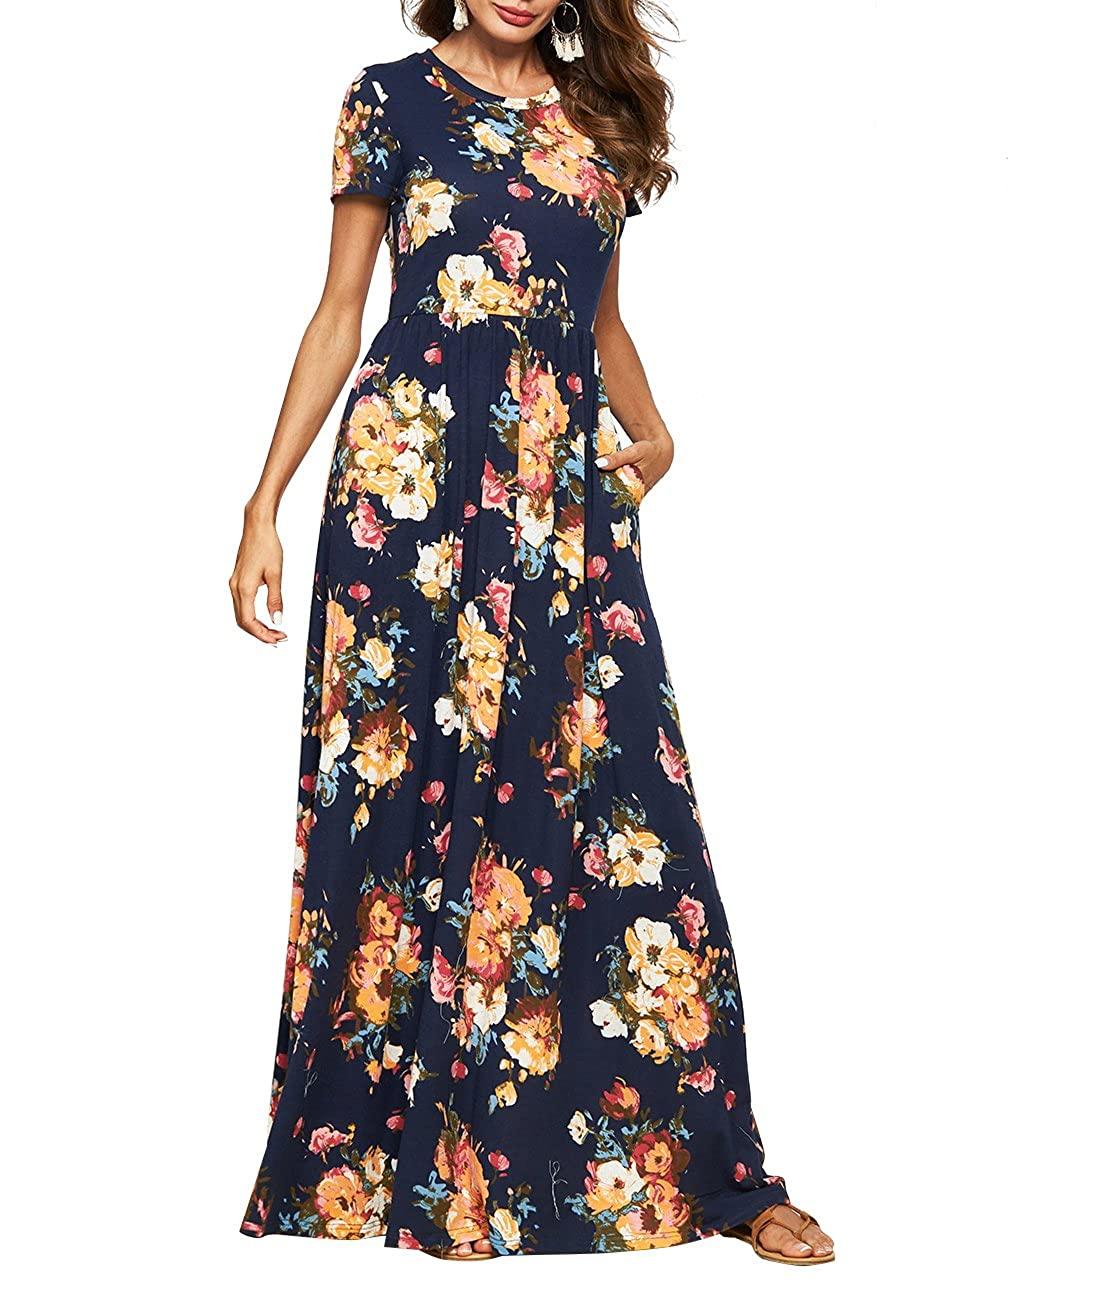 7d7a7cef661 Pull On closure. Summer Short Sleeve Maxi Dress for Women Long Beach Dress  Casual Floor Length Dress for Women. Features Short Sleeve